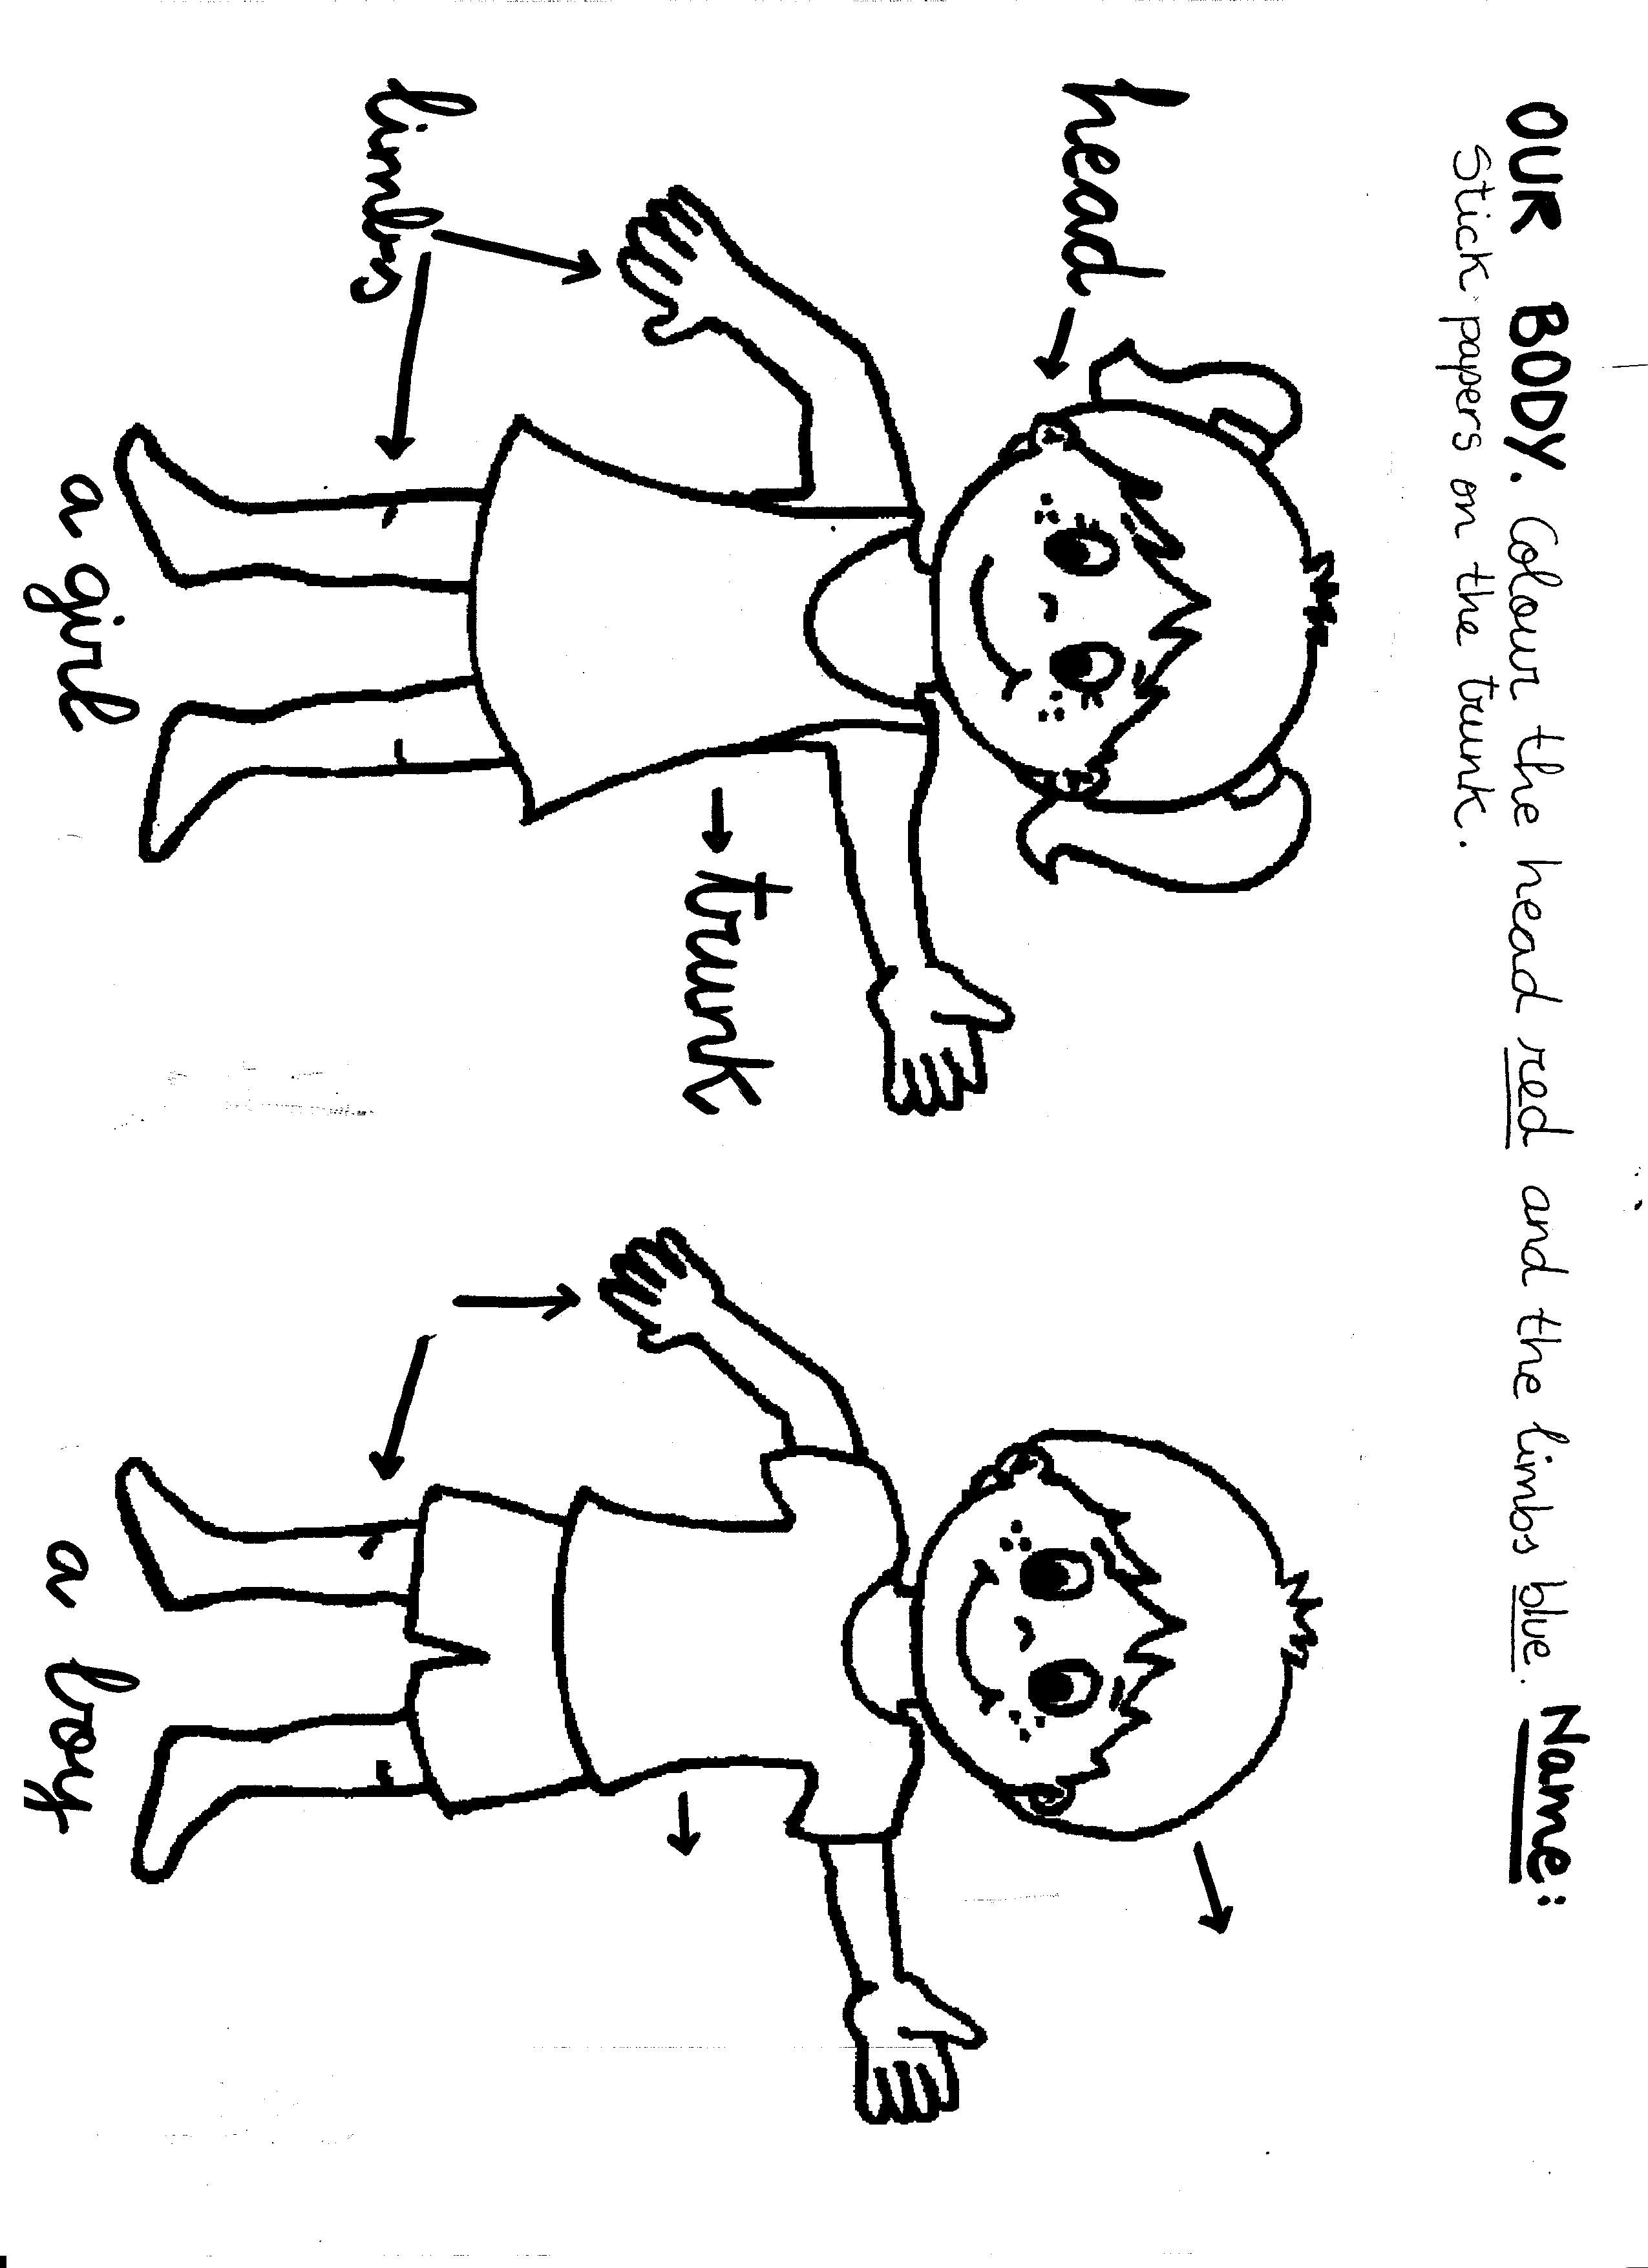 My Body Preschool Color Sheet Google Search Ecm Color Sheets